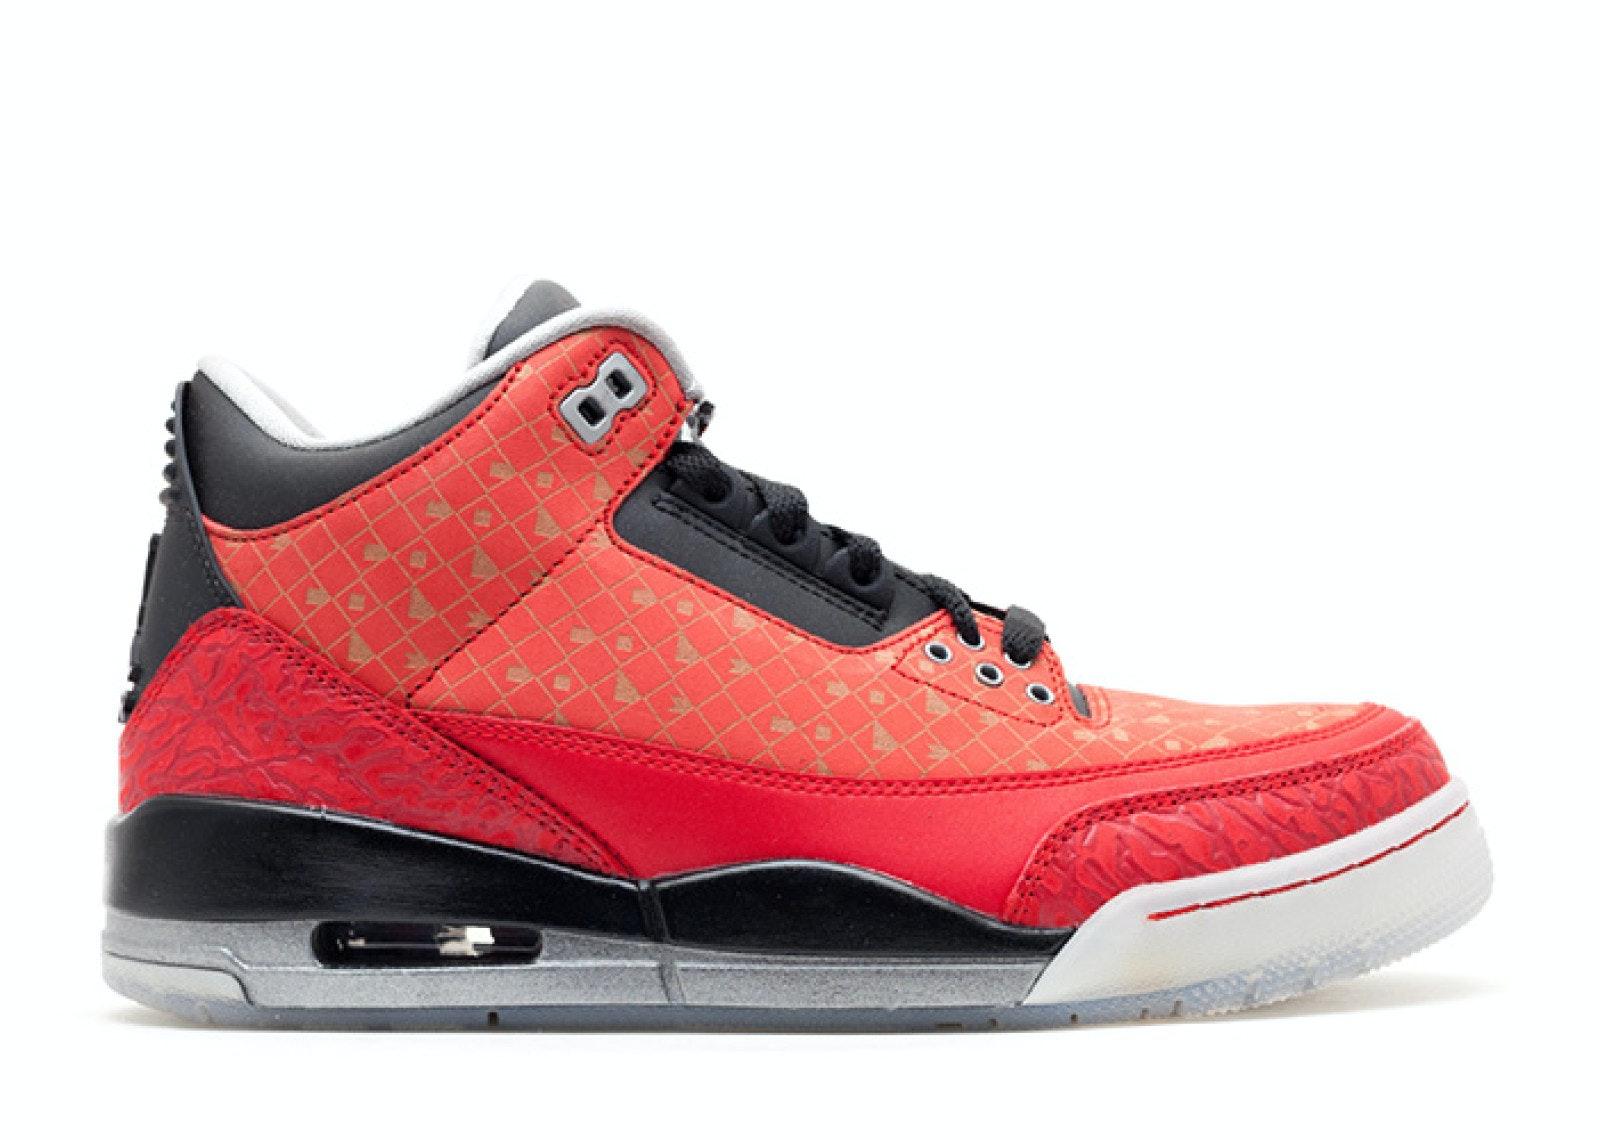 Jordan 3 Retro Doernbecher (2013)